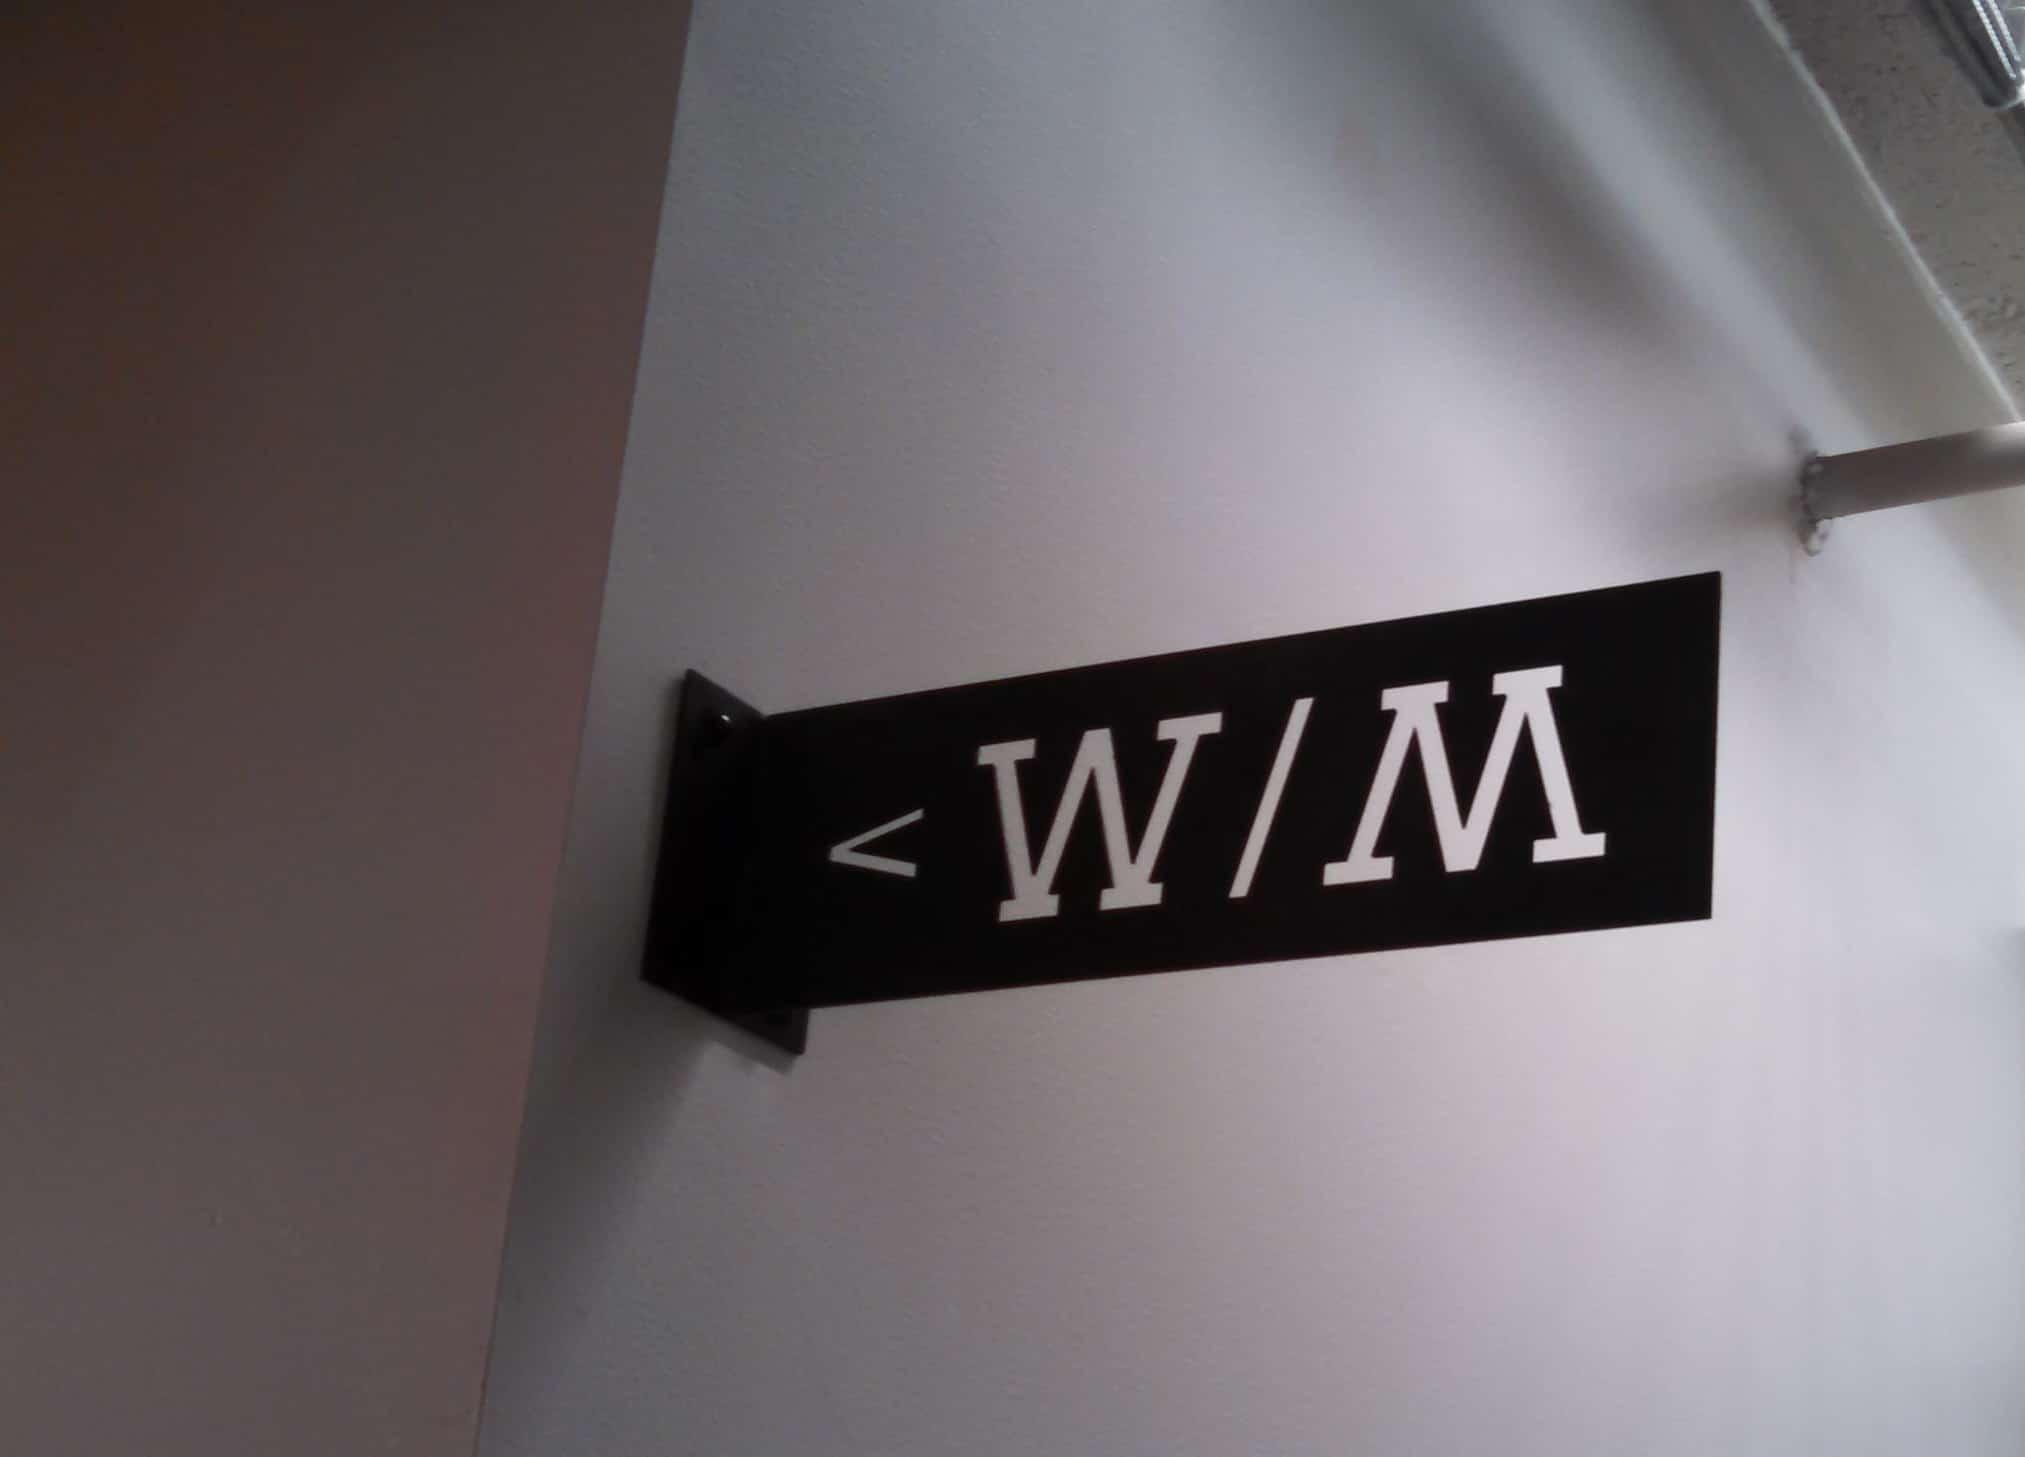 Converse Restroom Sign